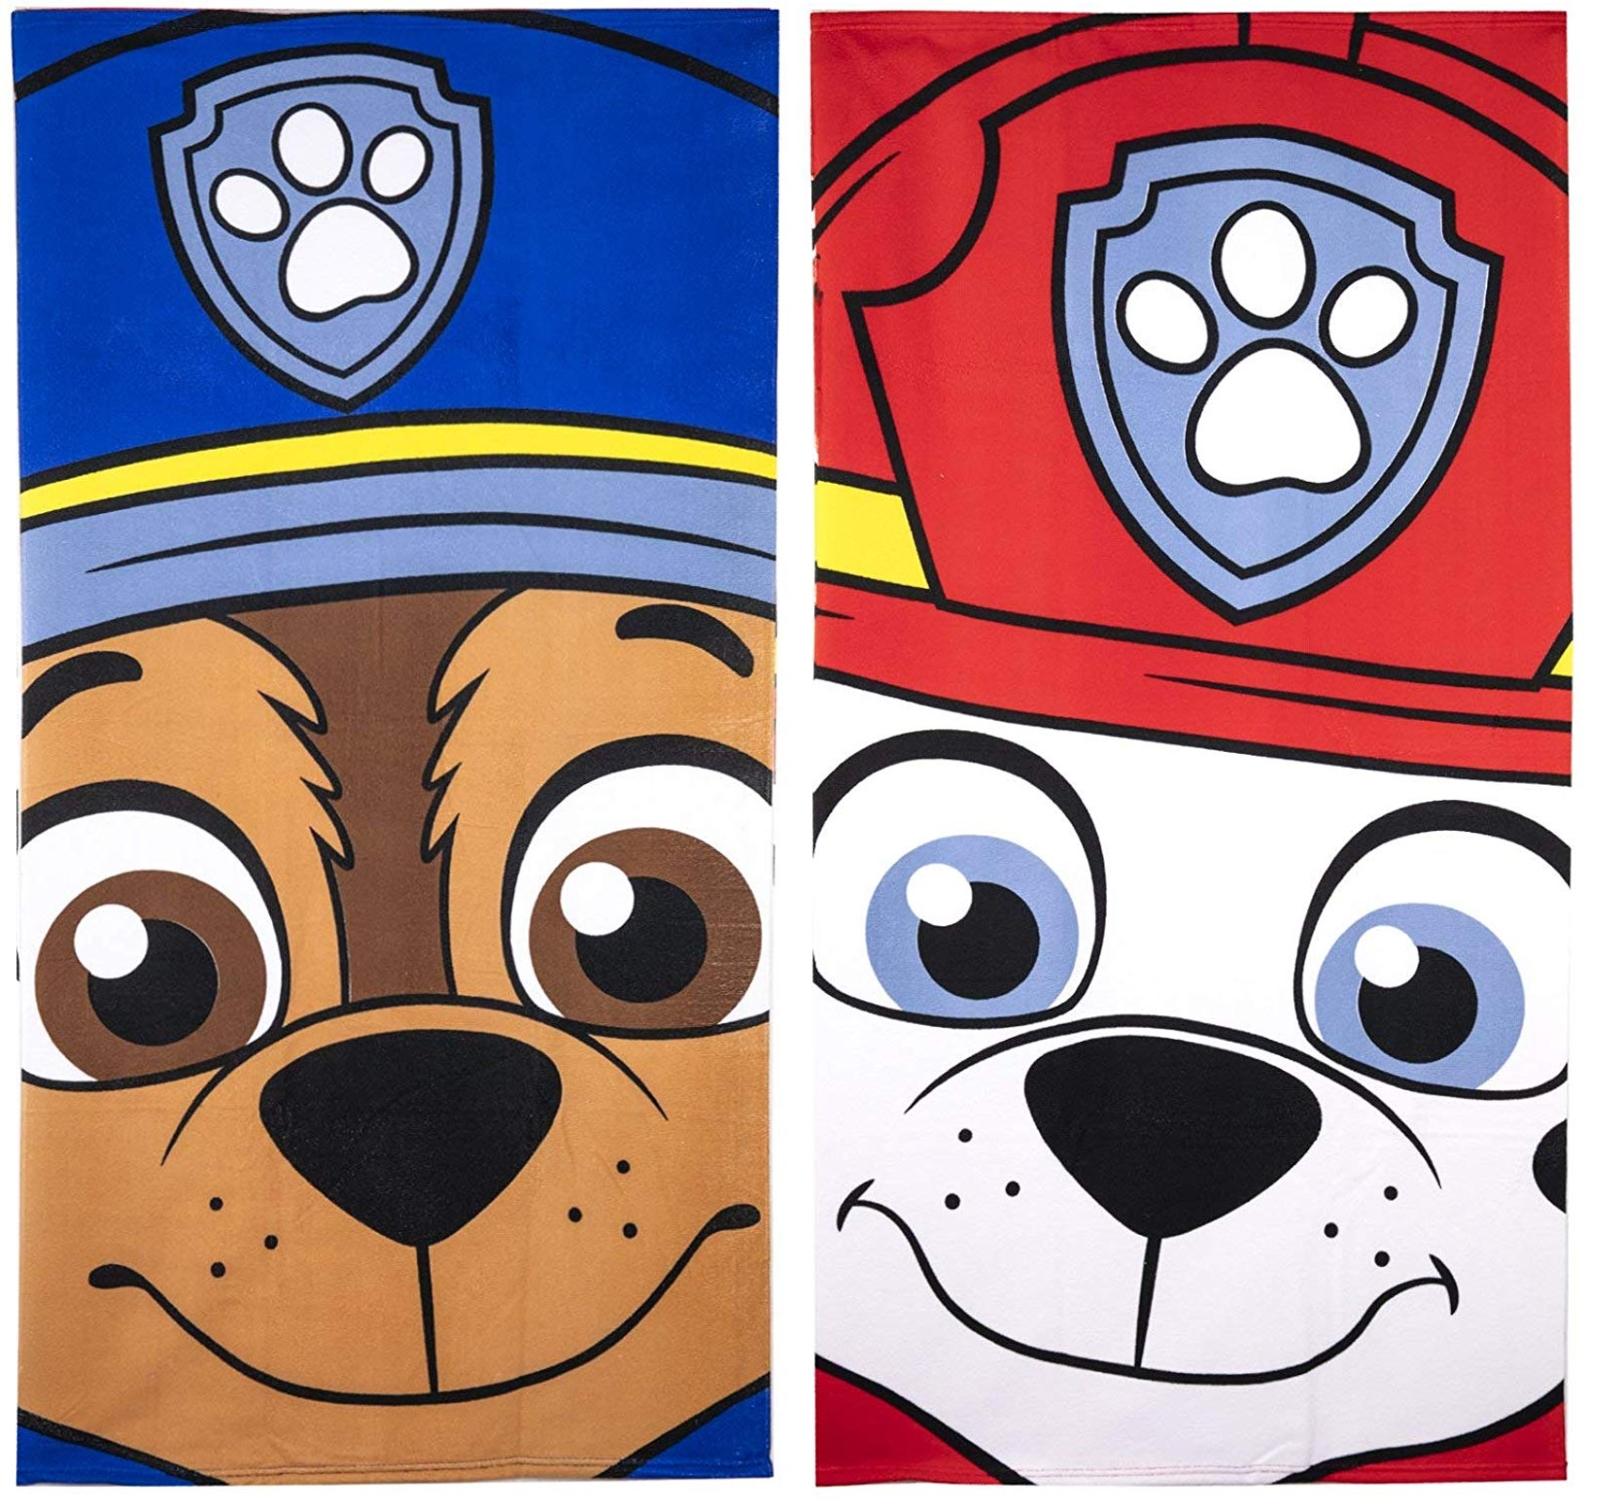 Paw Patrol Children Beach Towel,Swimming Towel,Bath Towel,Official Licensed